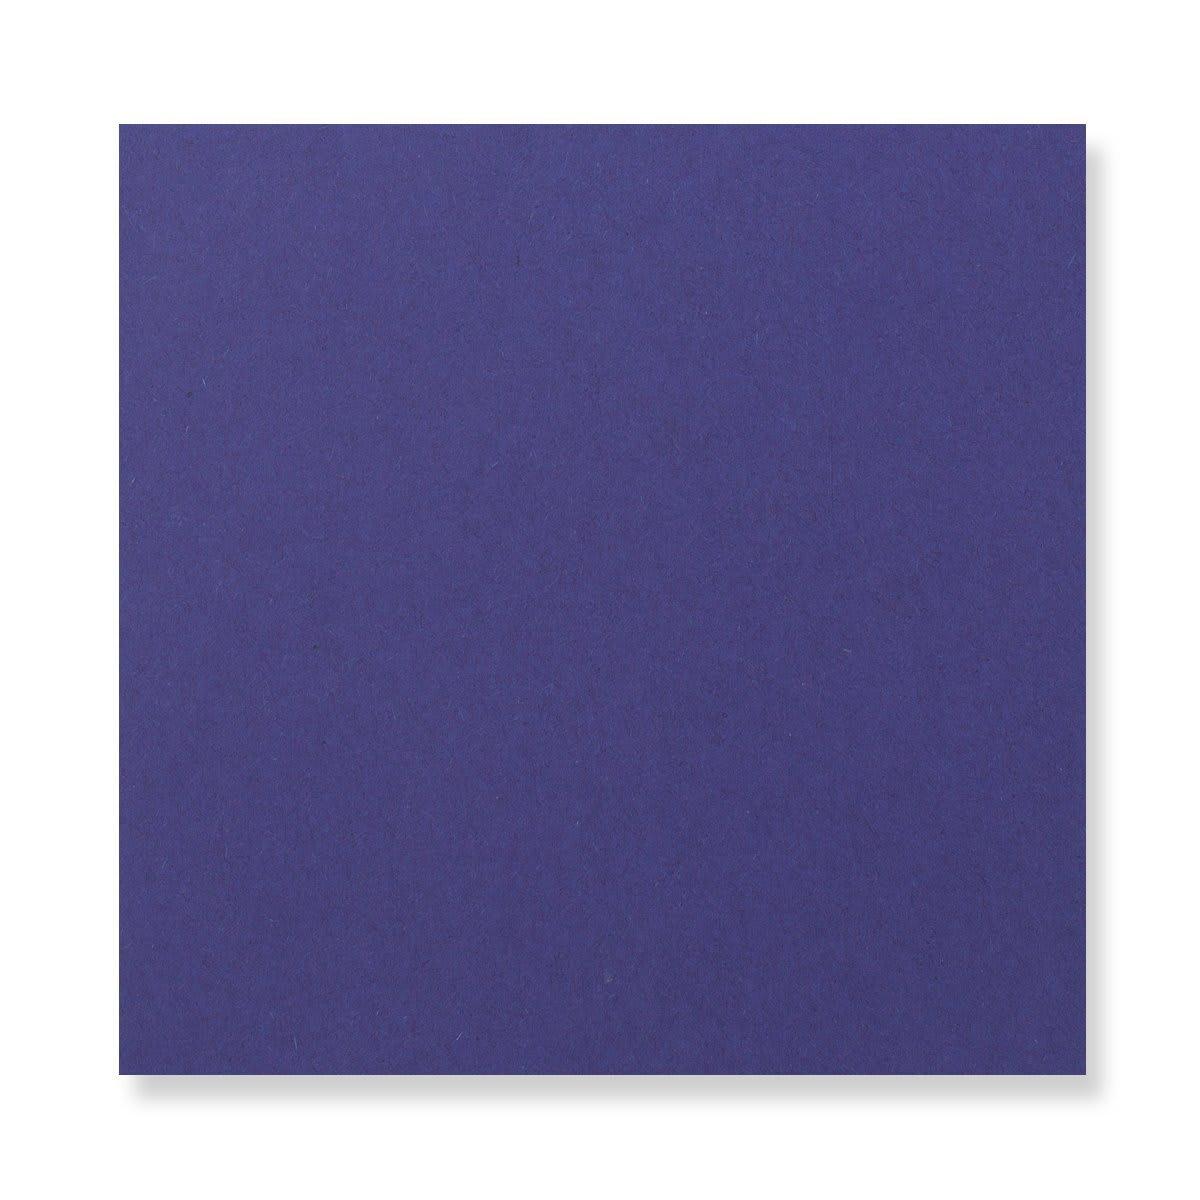 85 x 85mm NAVY BLUE MINI CD ENVELOPES